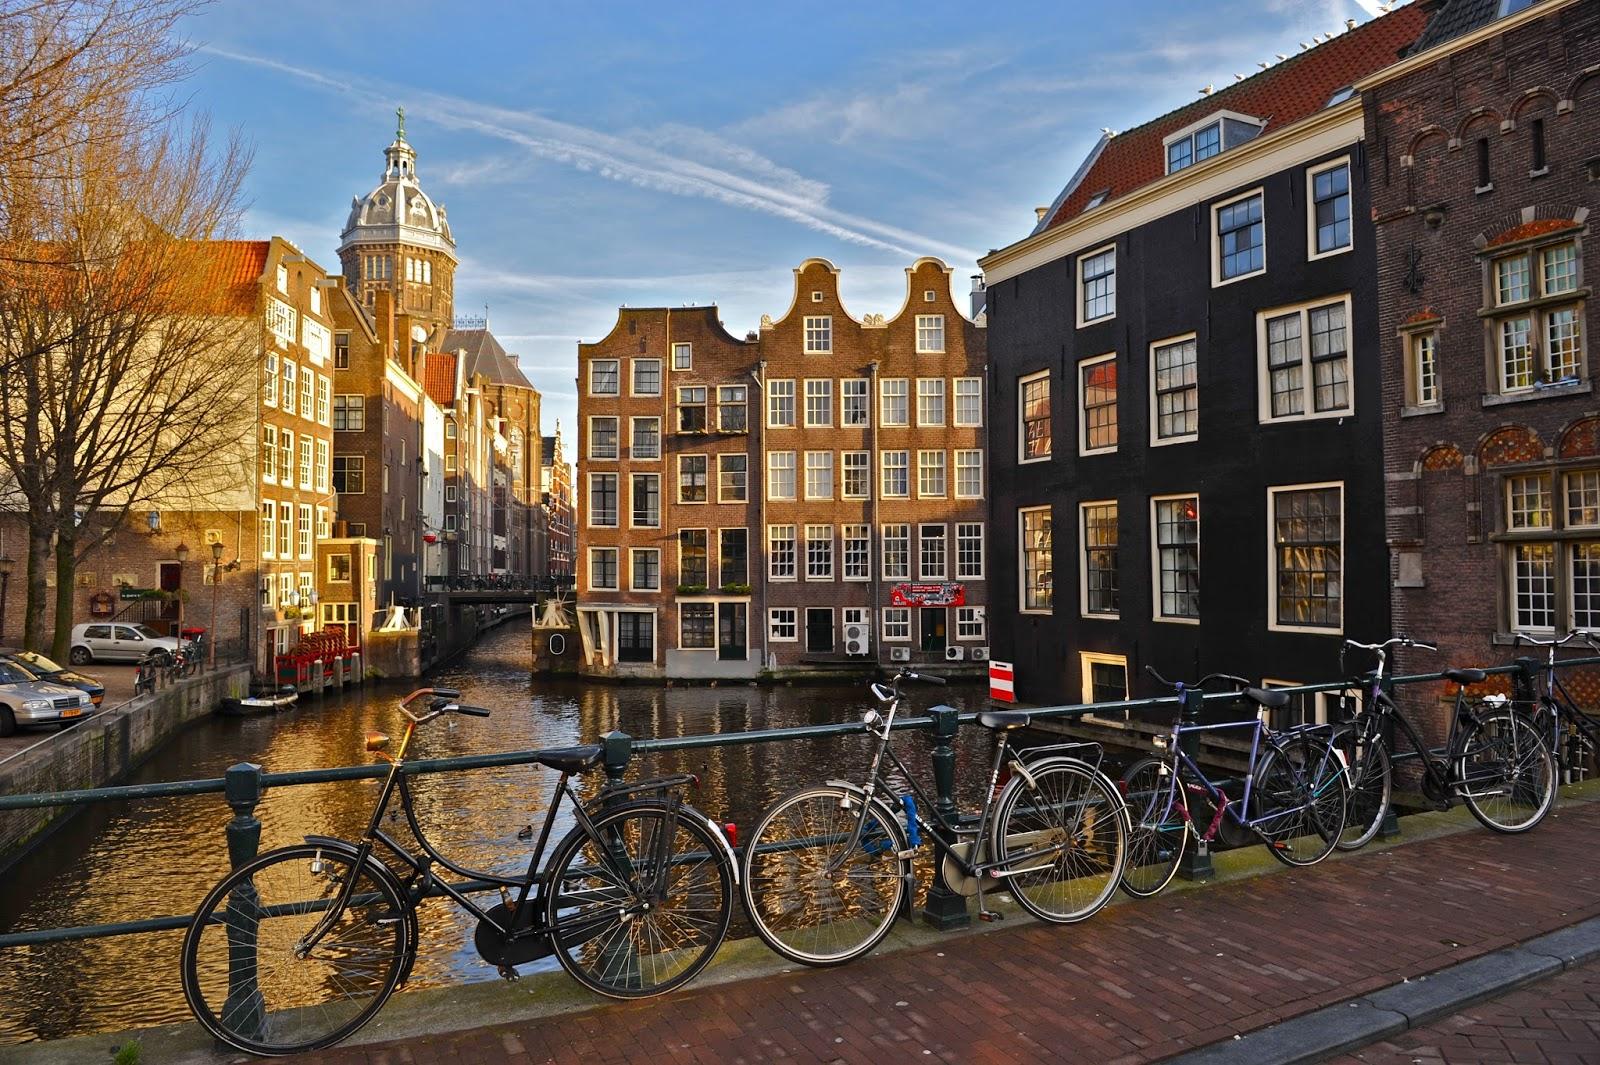 Travel  Adventures The Netherlands  Nederland  A voyage to Netherlands Europe  Amsterdam